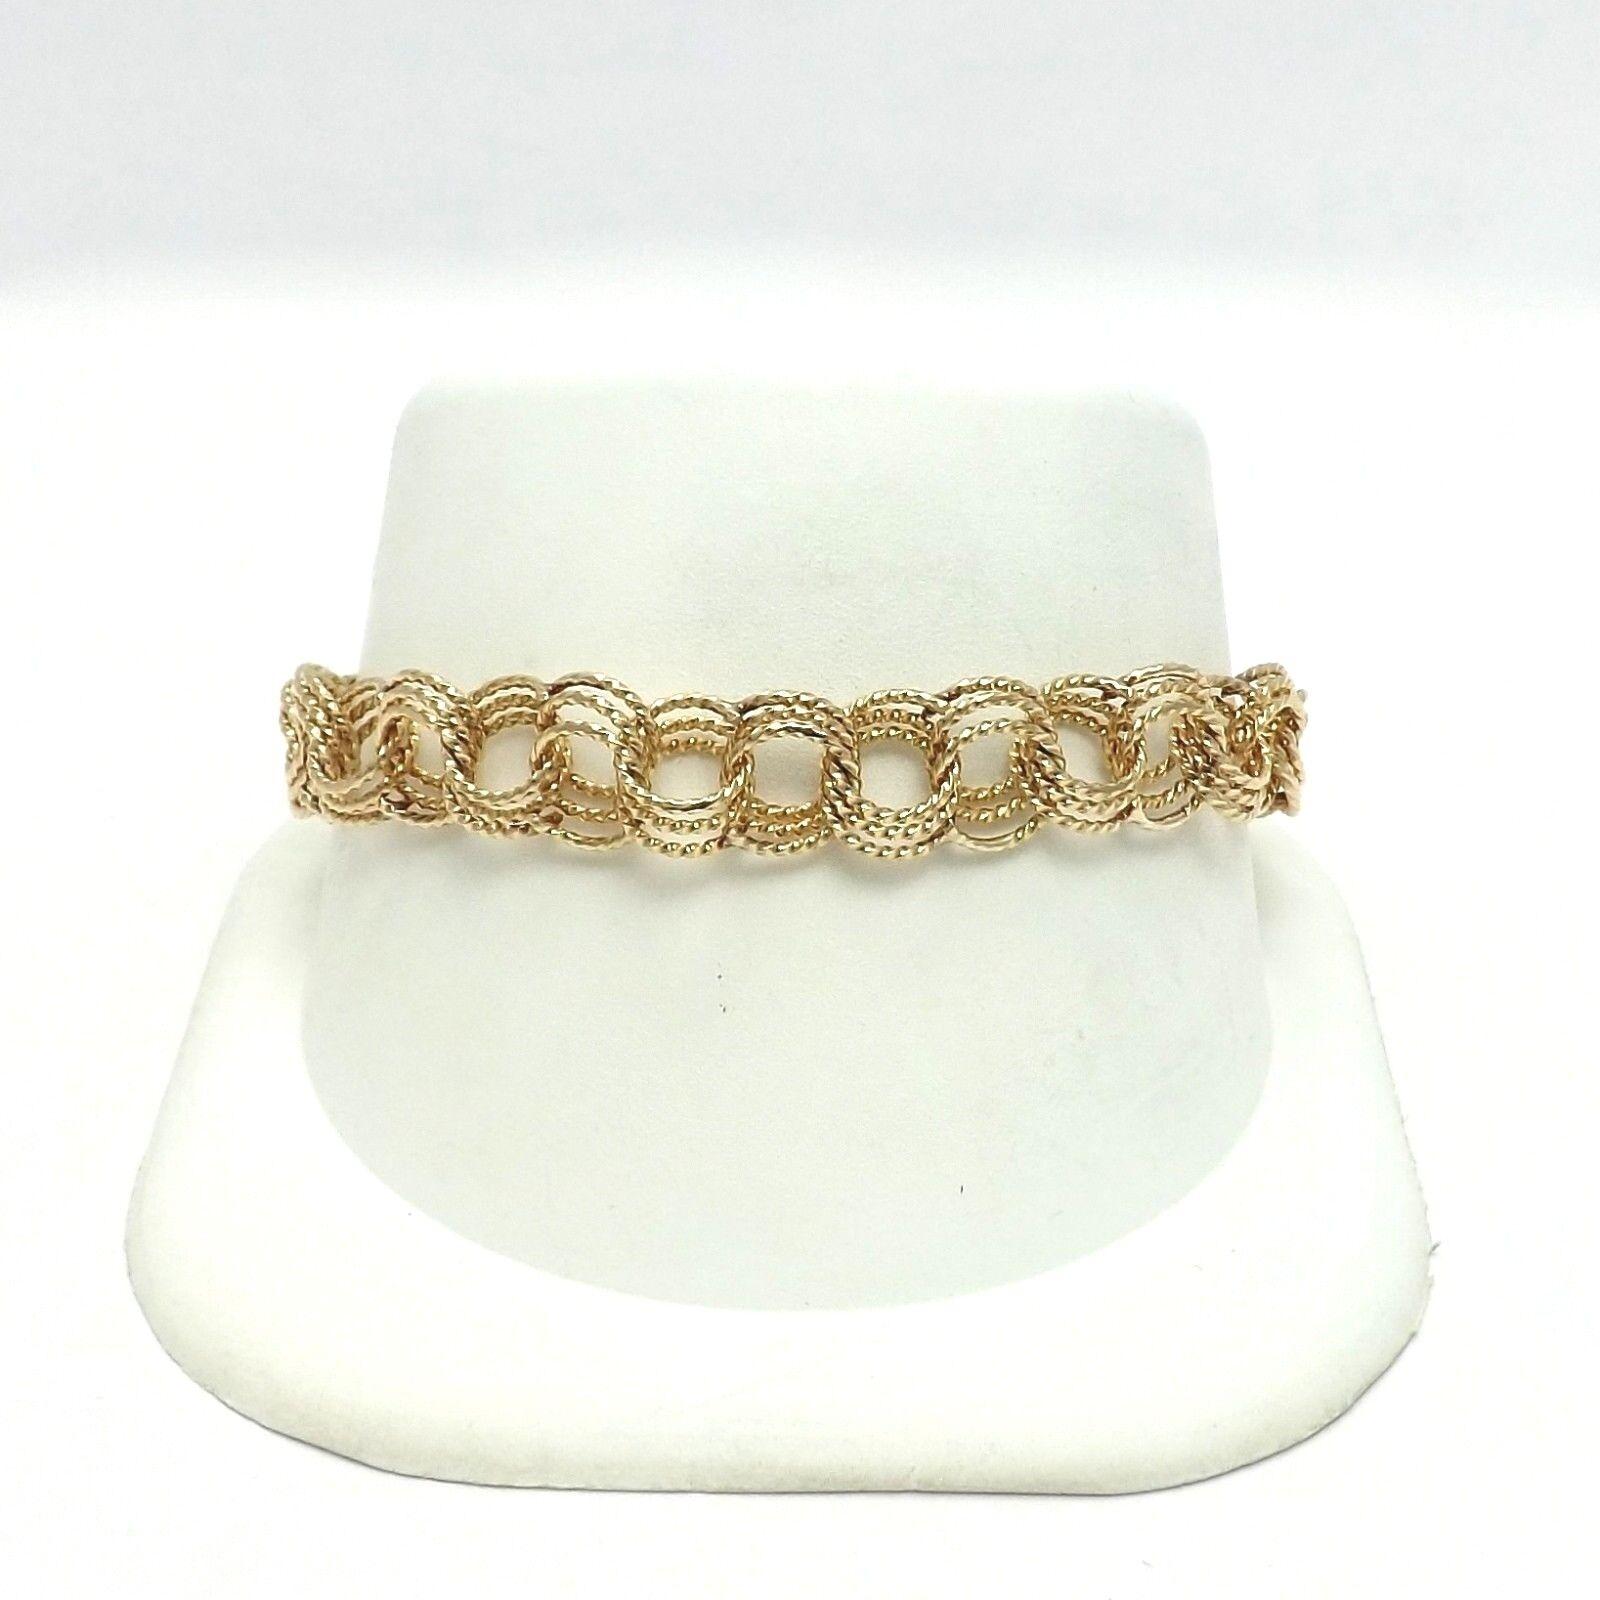 14k gold Vintage Solid Textured Triple Wire Charm Bracelet 7.5